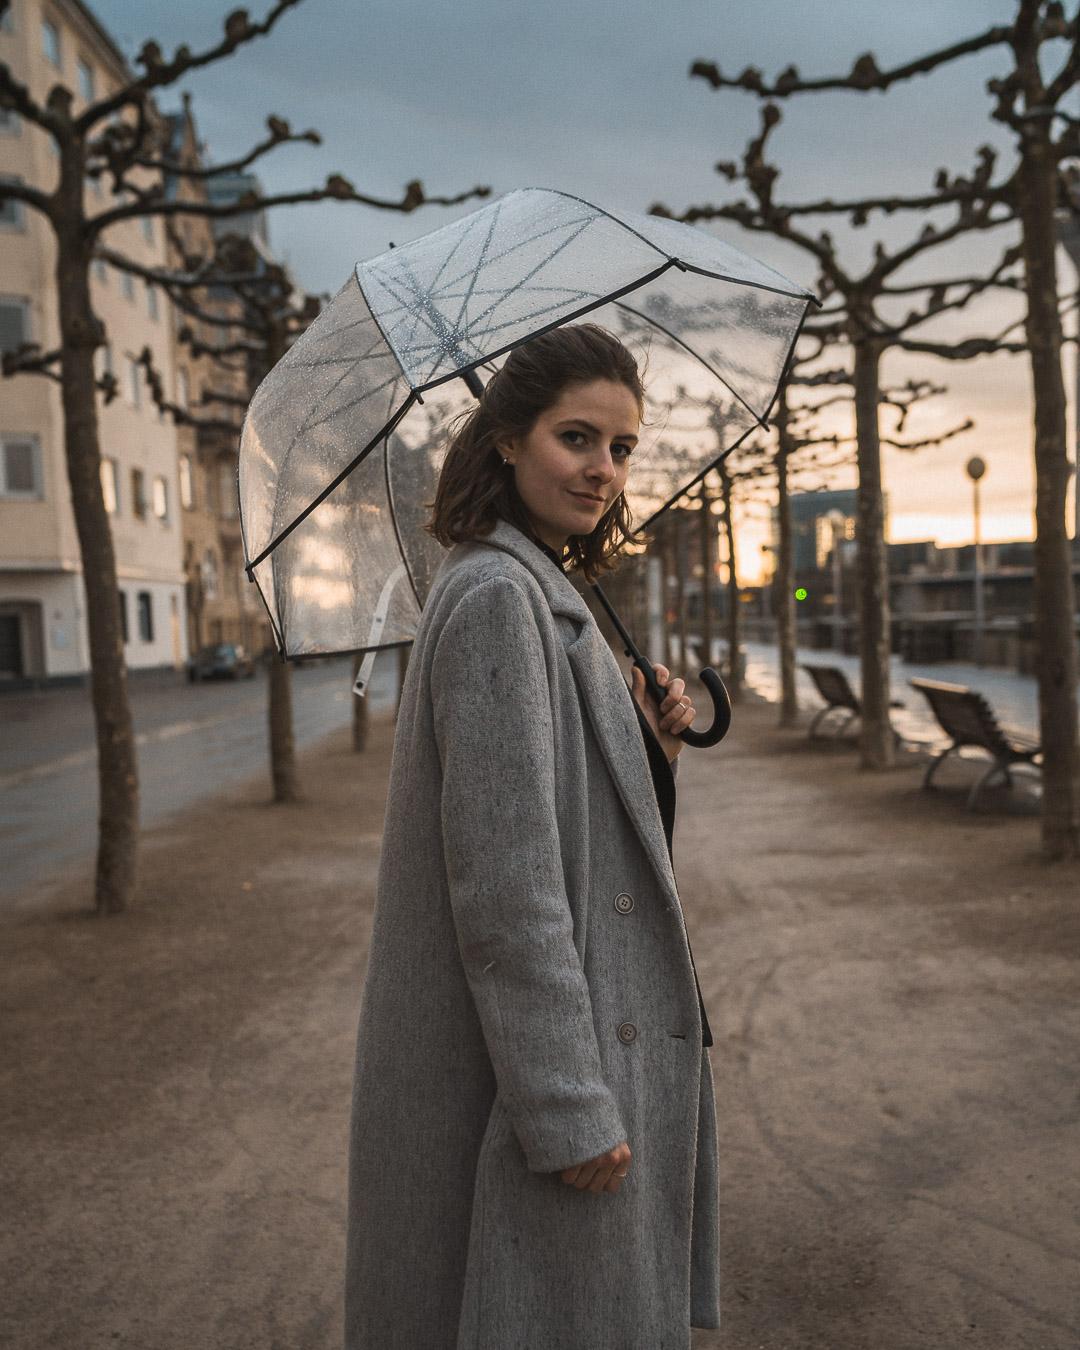 birthe-high-fashion-editorial-modeblogger-influencer-photographer-fotograf-germany